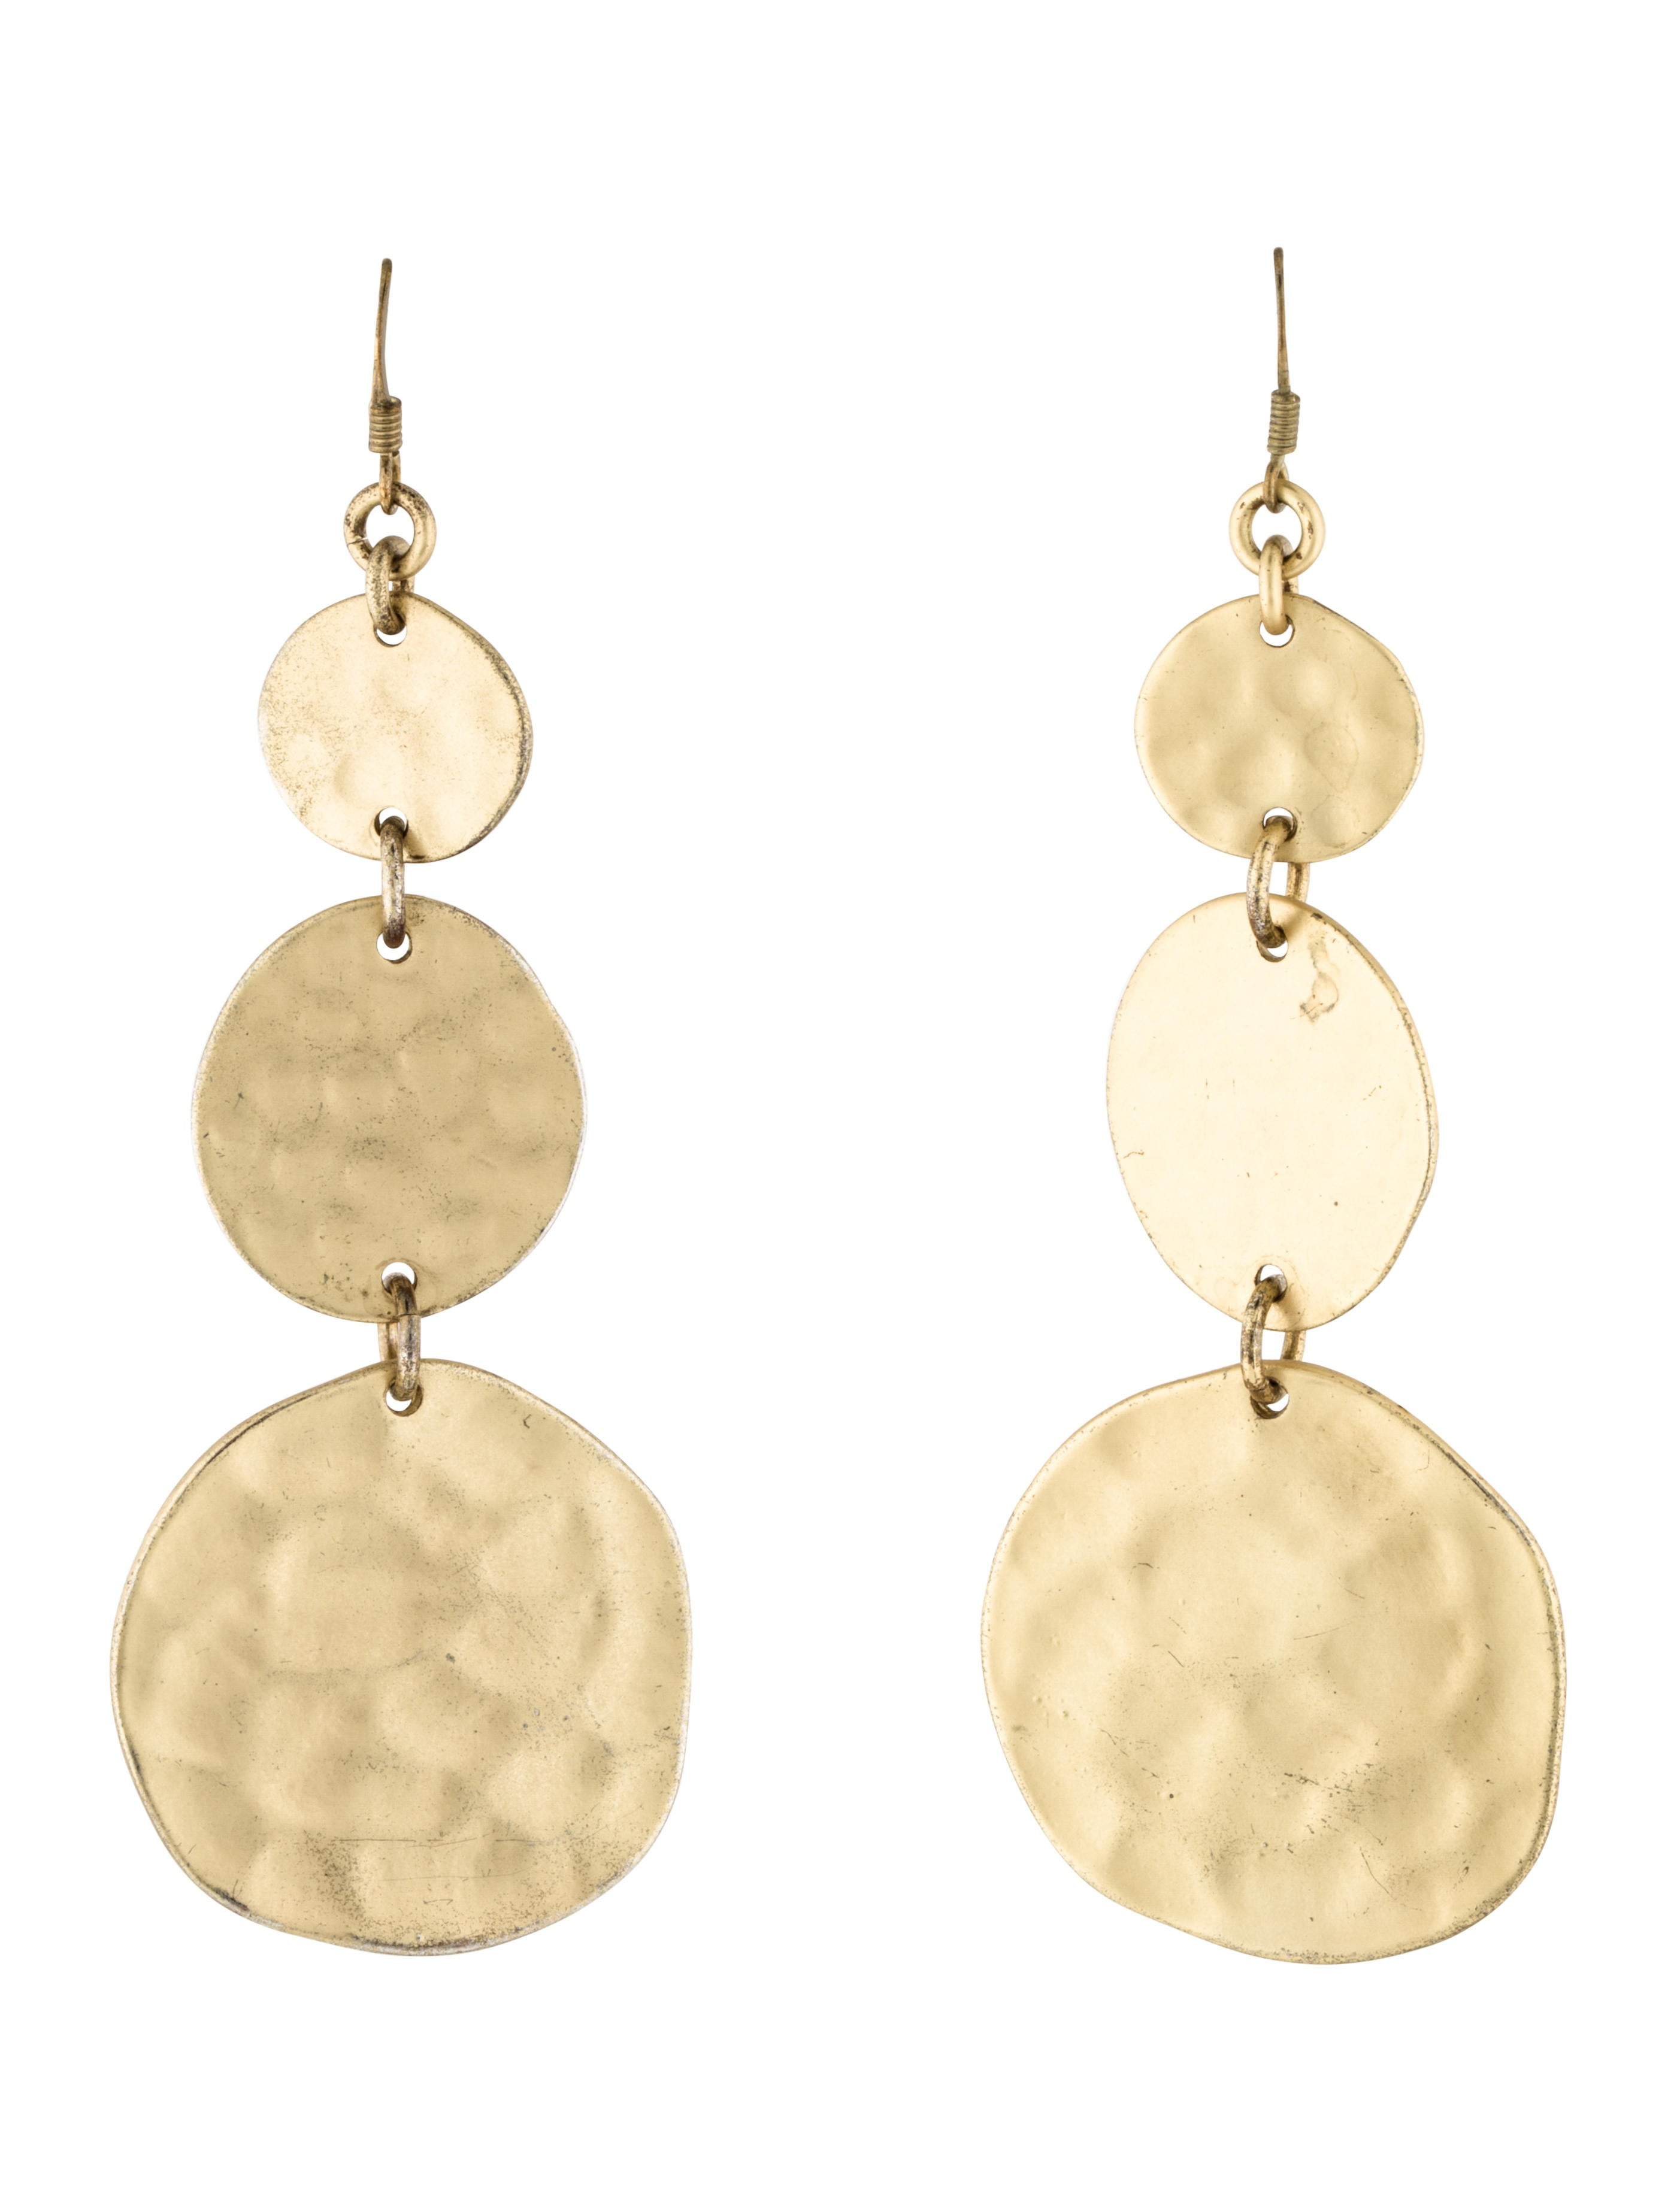 kenneth jay lane hammered earrings earrings wke22797 the realreal. Black Bedroom Furniture Sets. Home Design Ideas